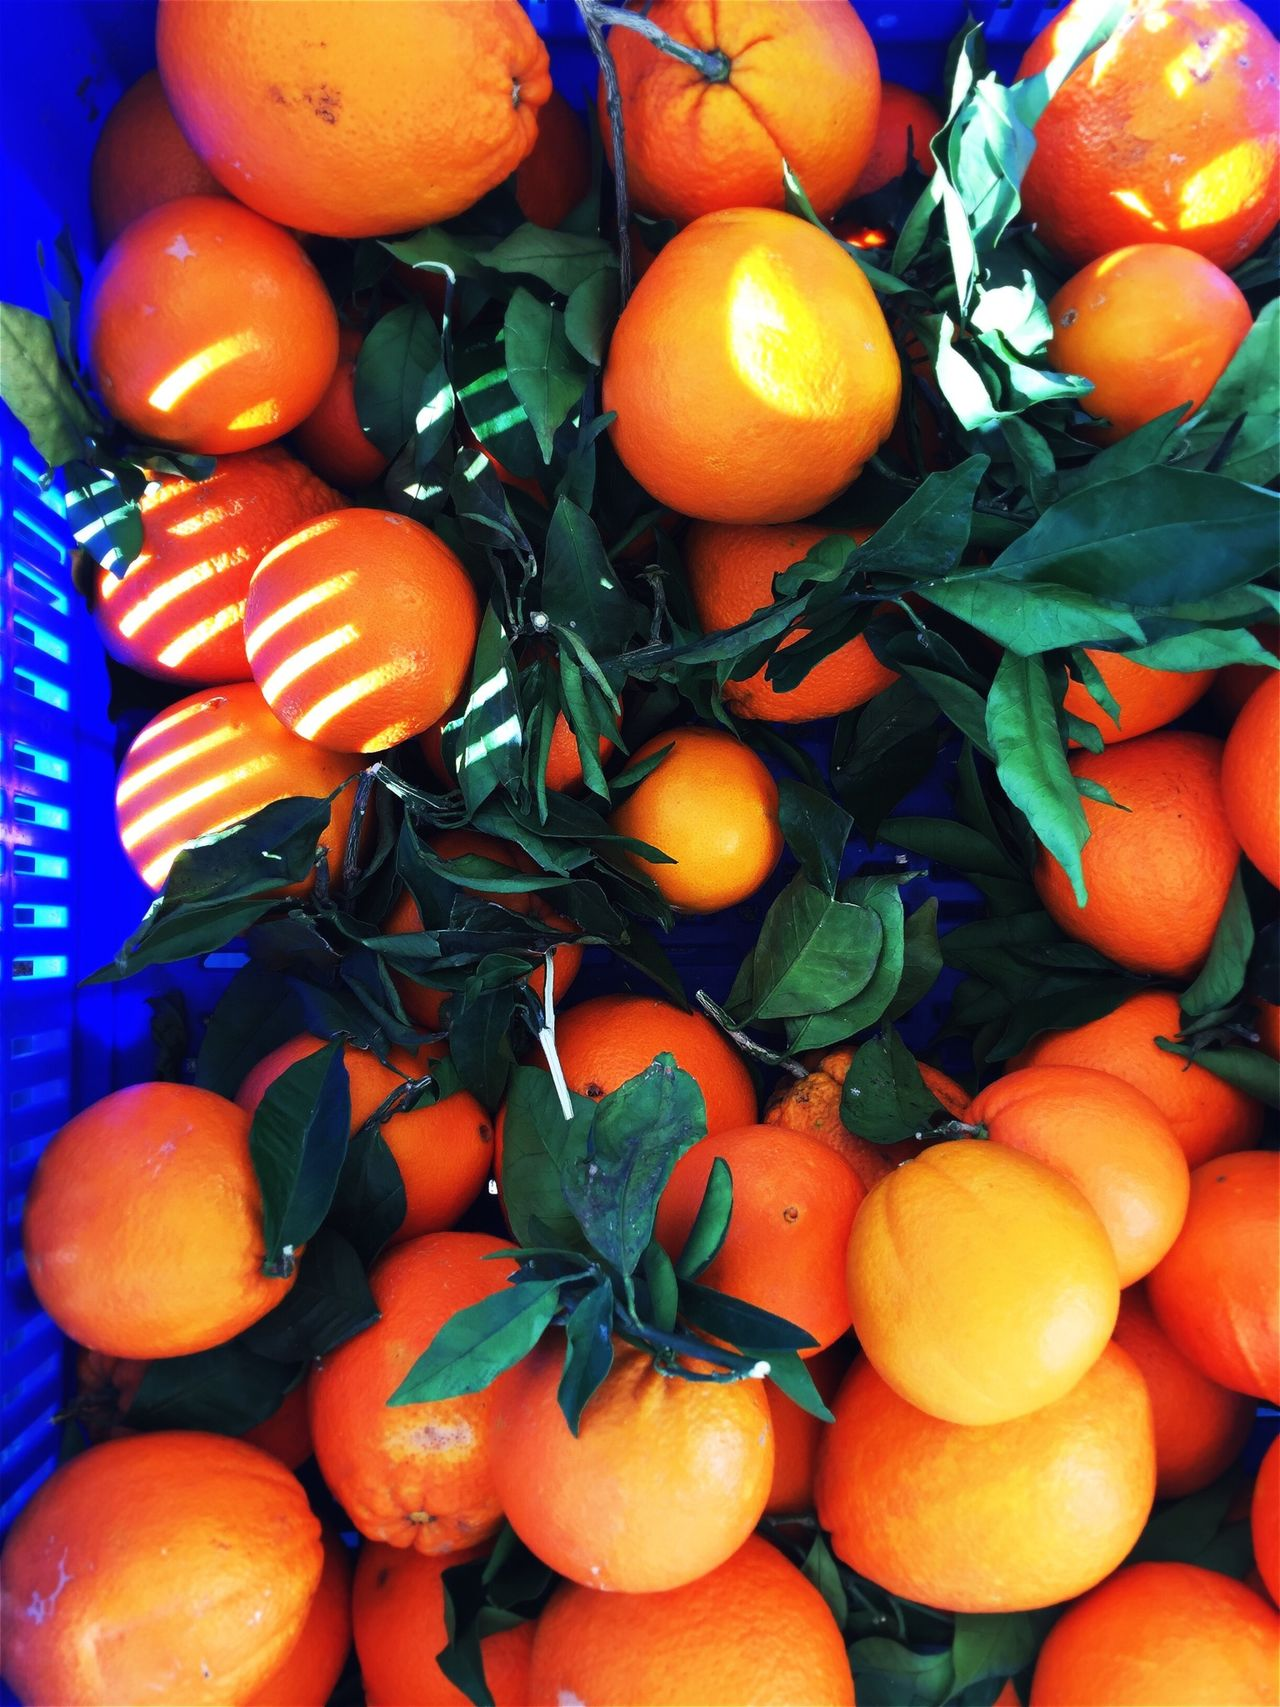 Fresh oranges in a box Orange Fruit Oranges SPAIN Harvest Agriculture Italien Diet Leaves Green Box Bio Food Healthy Health Farm Vitamins Fresh Market Shop Fruits Nobody Spanish Travel Juice